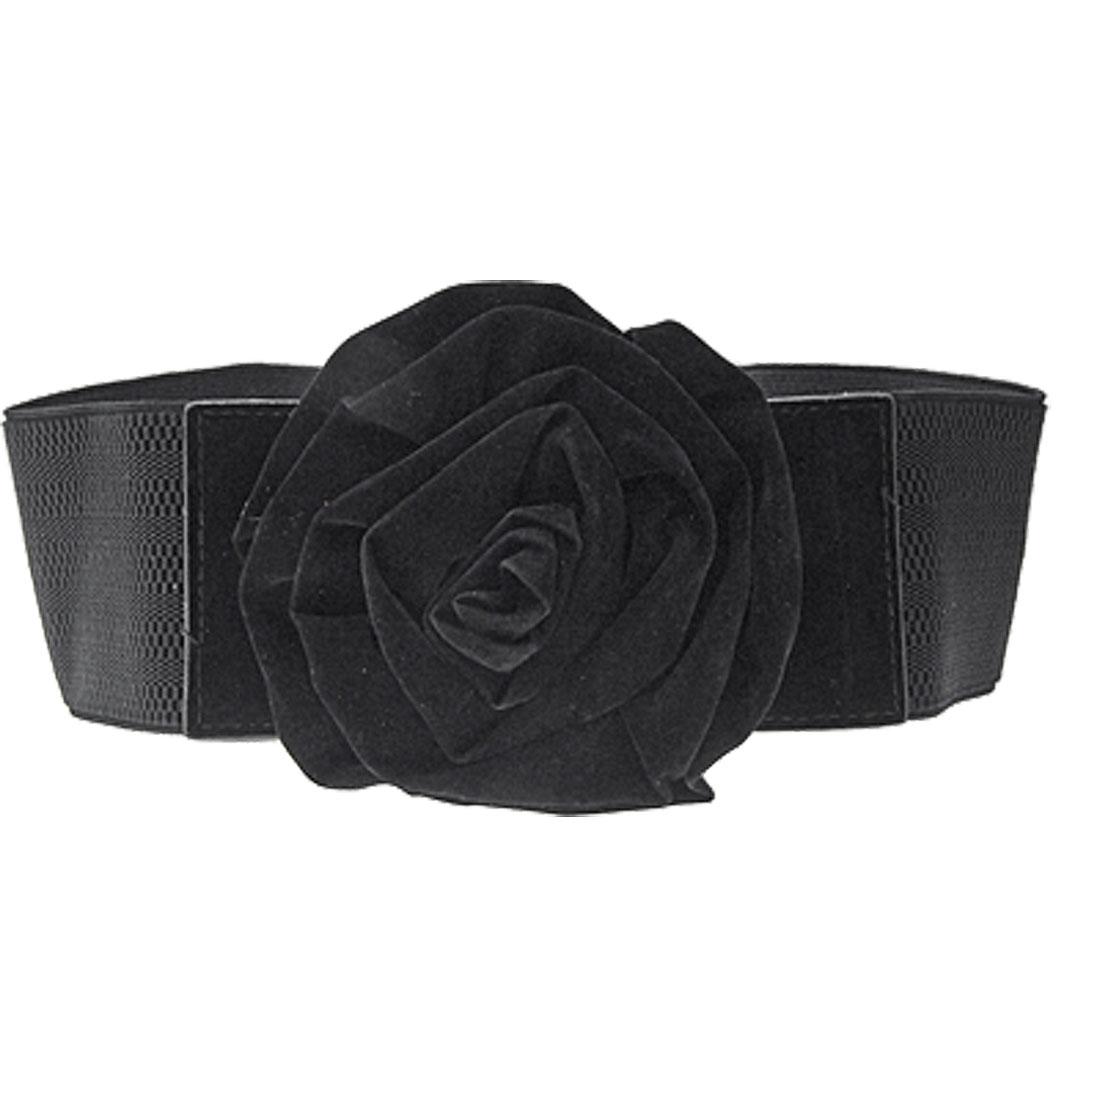 Flower Buckle Elastic Nylon Ladies Waist Belt Black